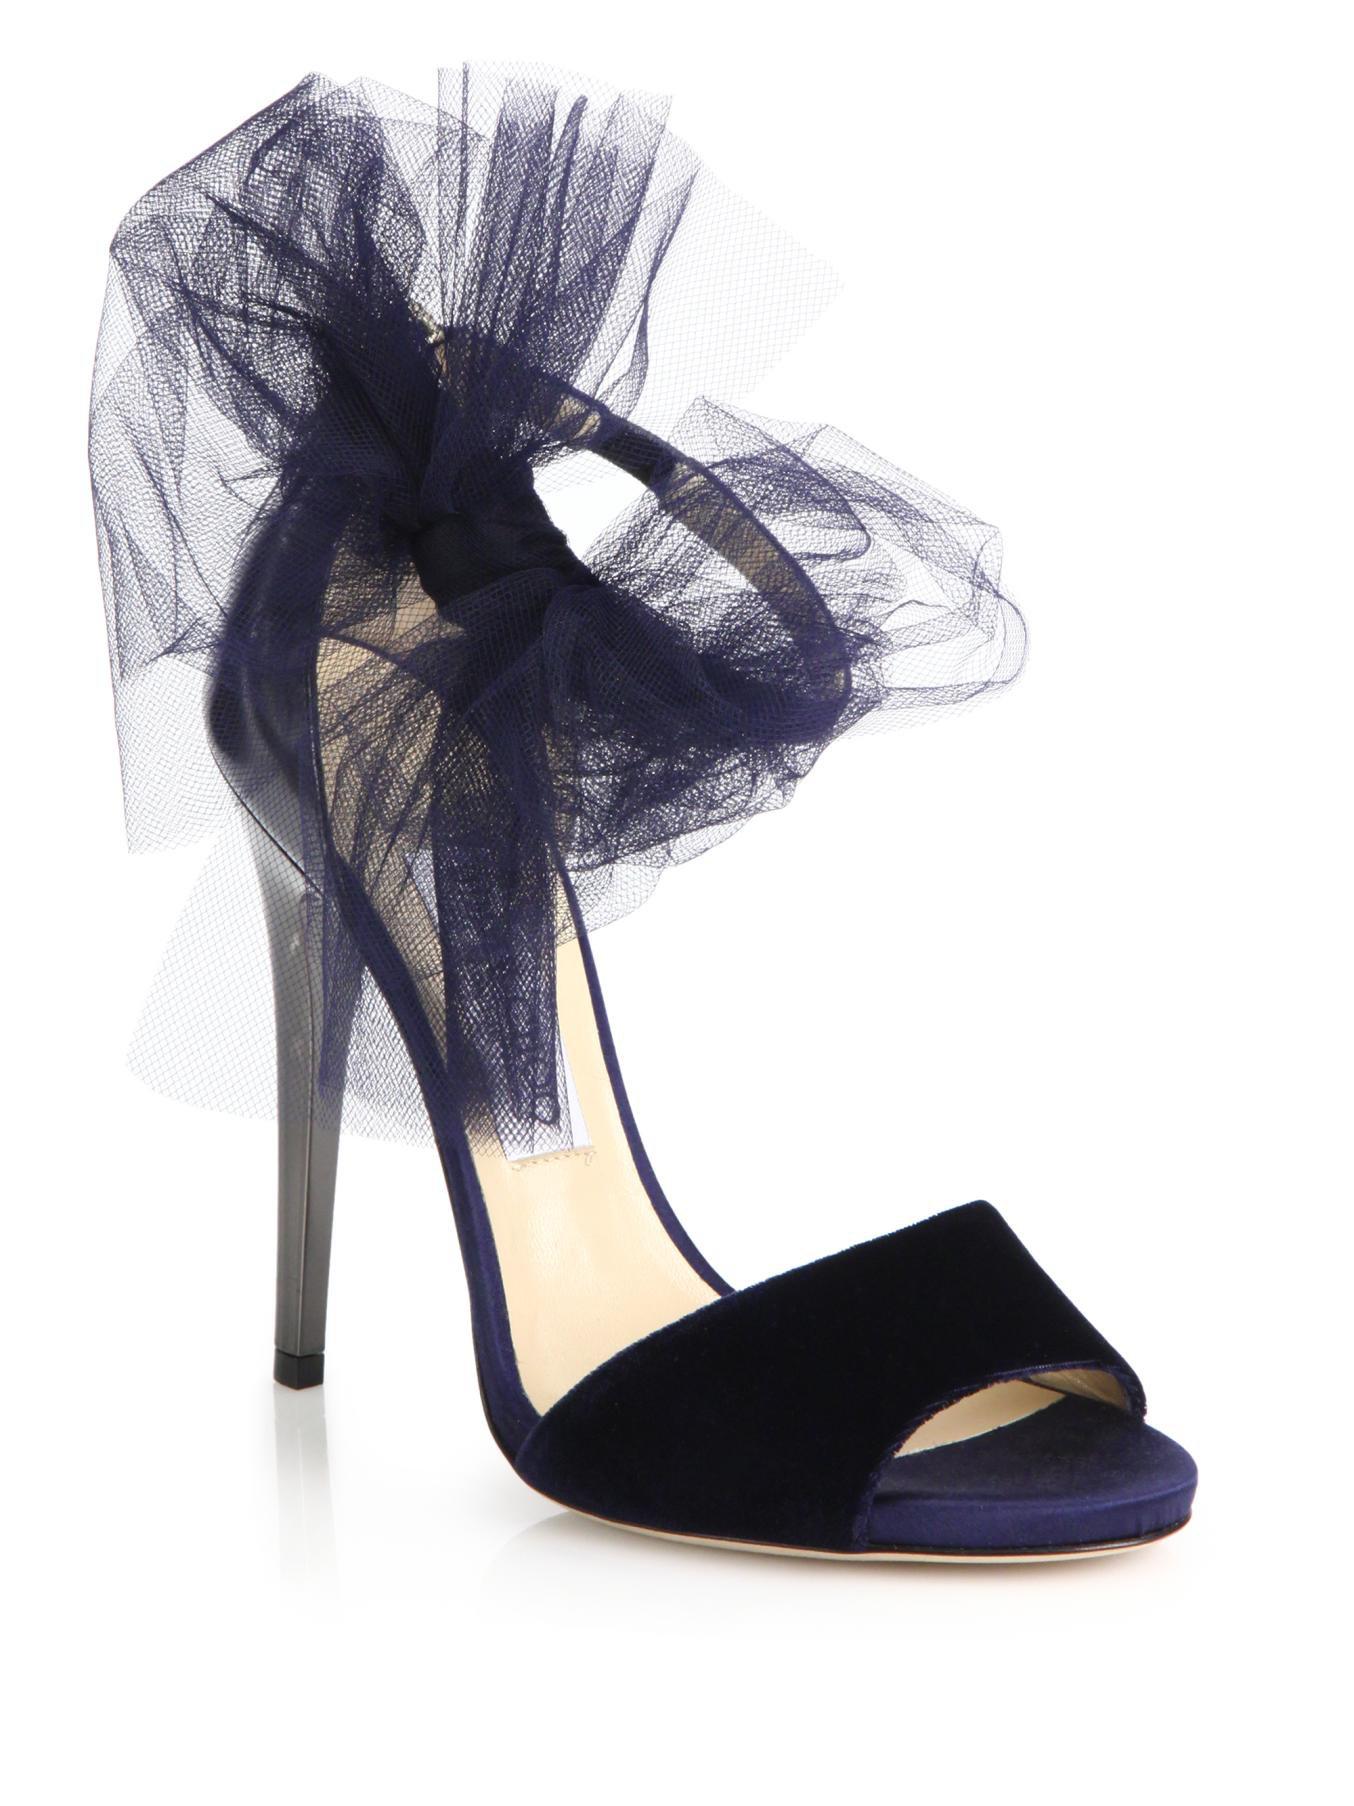 3be08c514eab Lyst - Jimmy Choo  Lilyth 100  Tulle Bow Velvet Sandals in Blue